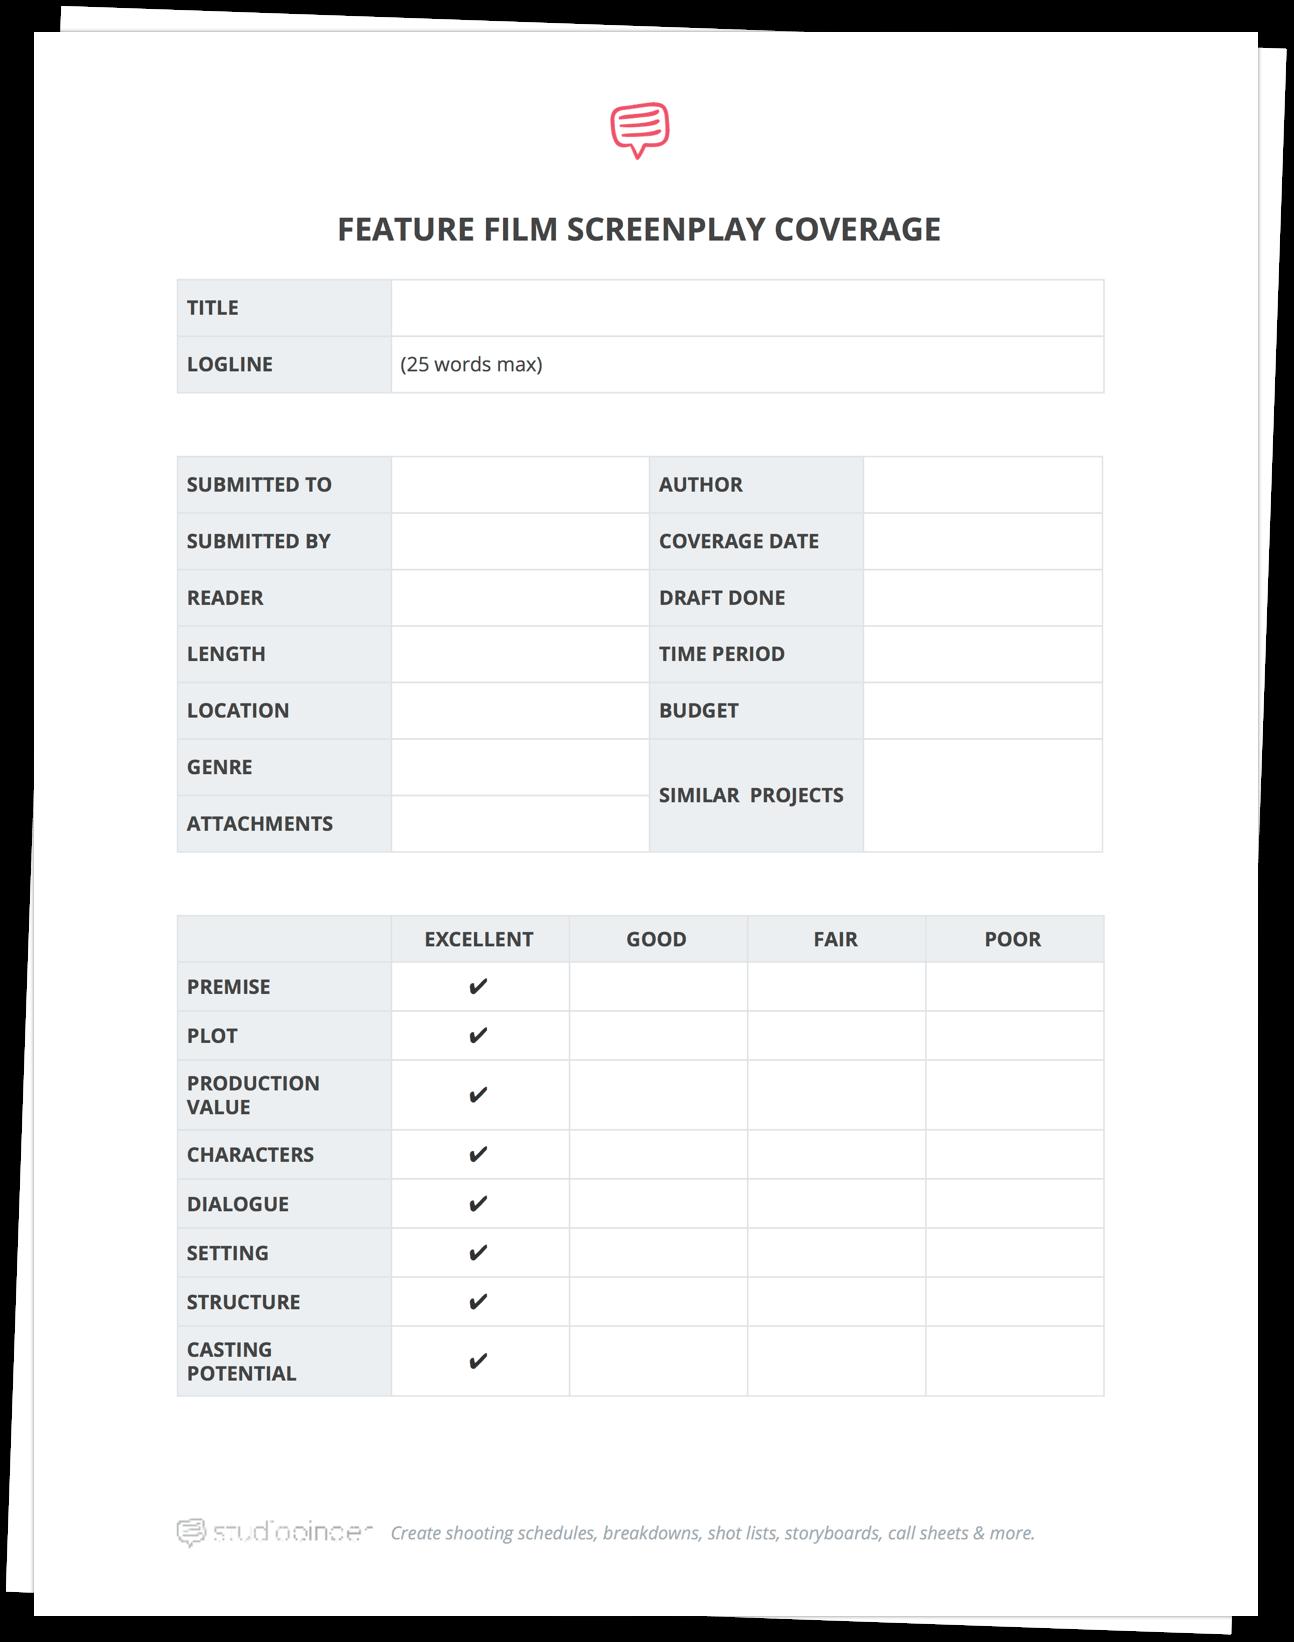 Download FREE Script Coverage Template | StudioBinder